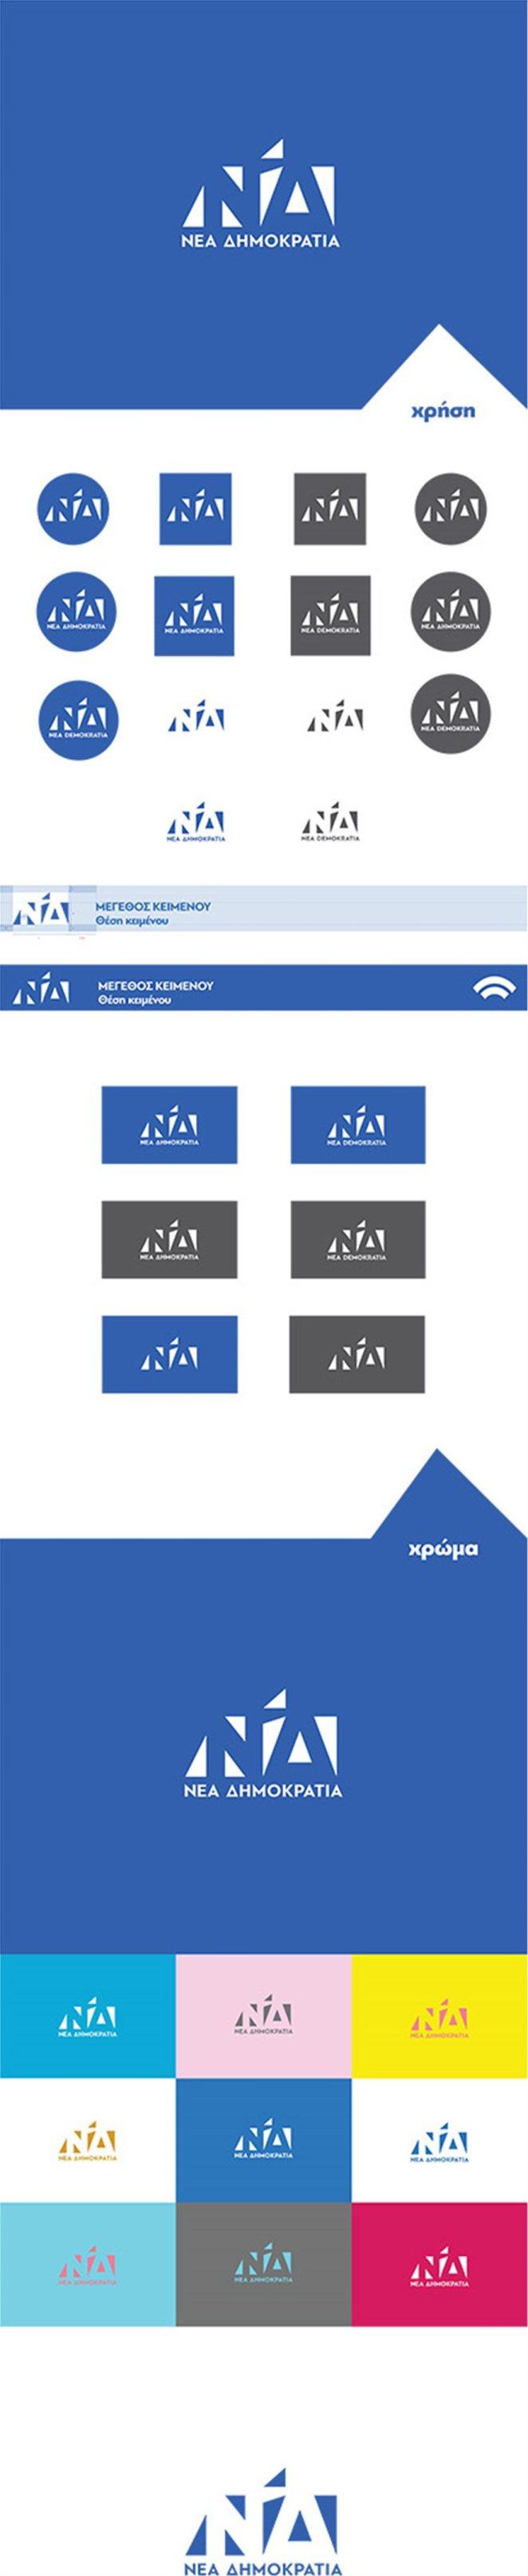 nd-logo01